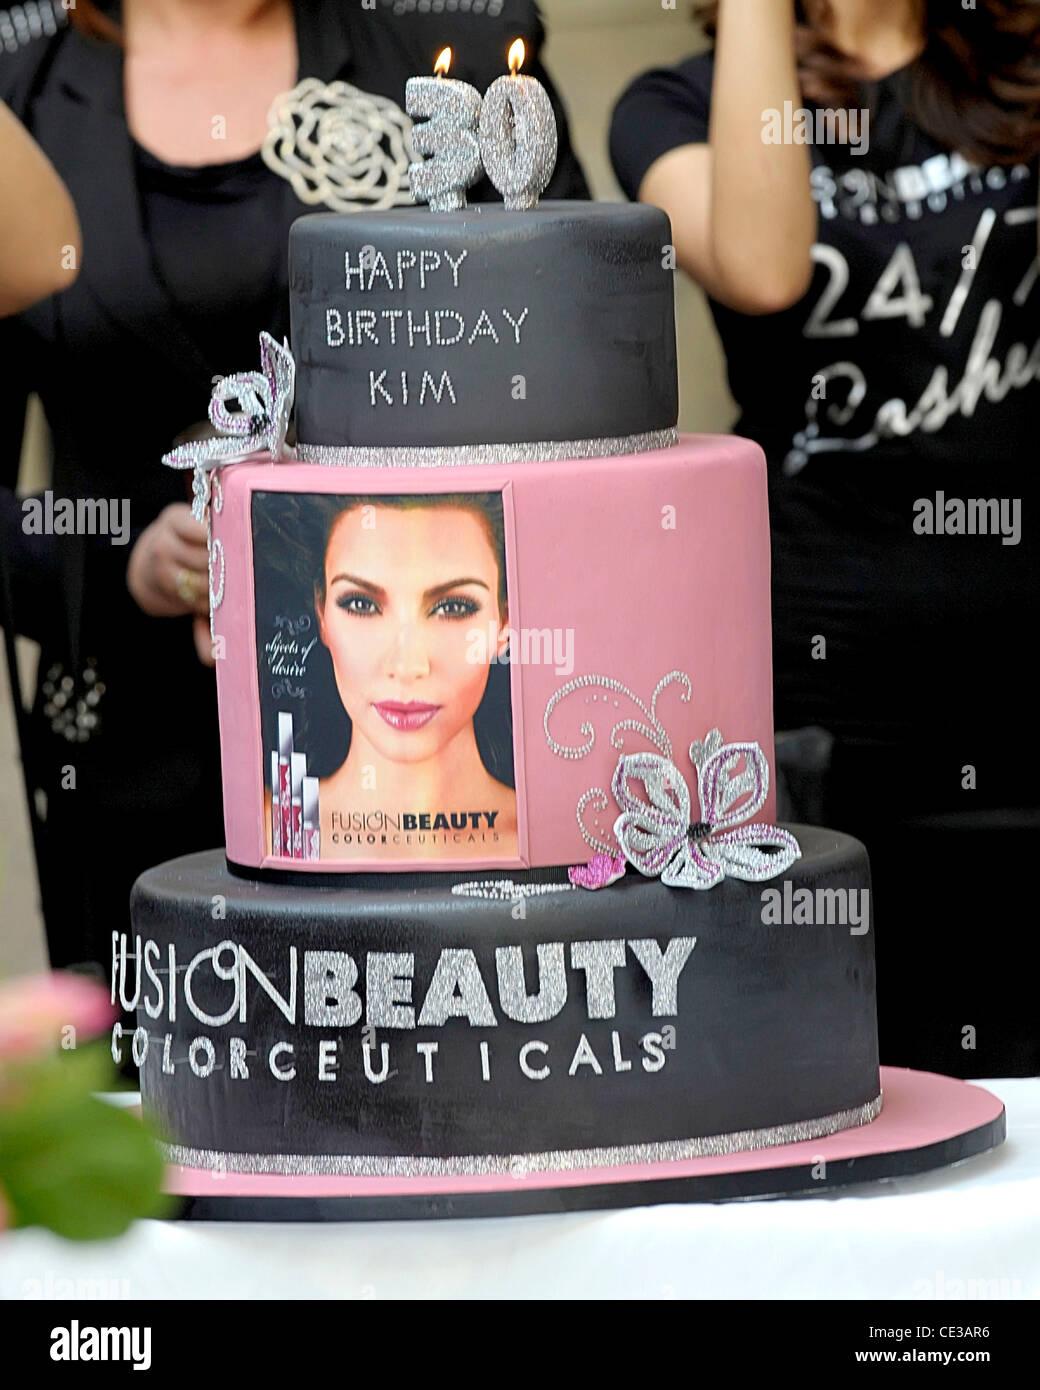 Funny 30th Birthday Cakes For Her : funny, birthday, cakes, Kardashian's, Birthday, Cake,, Presented, During, Stock, Photo, Alamy